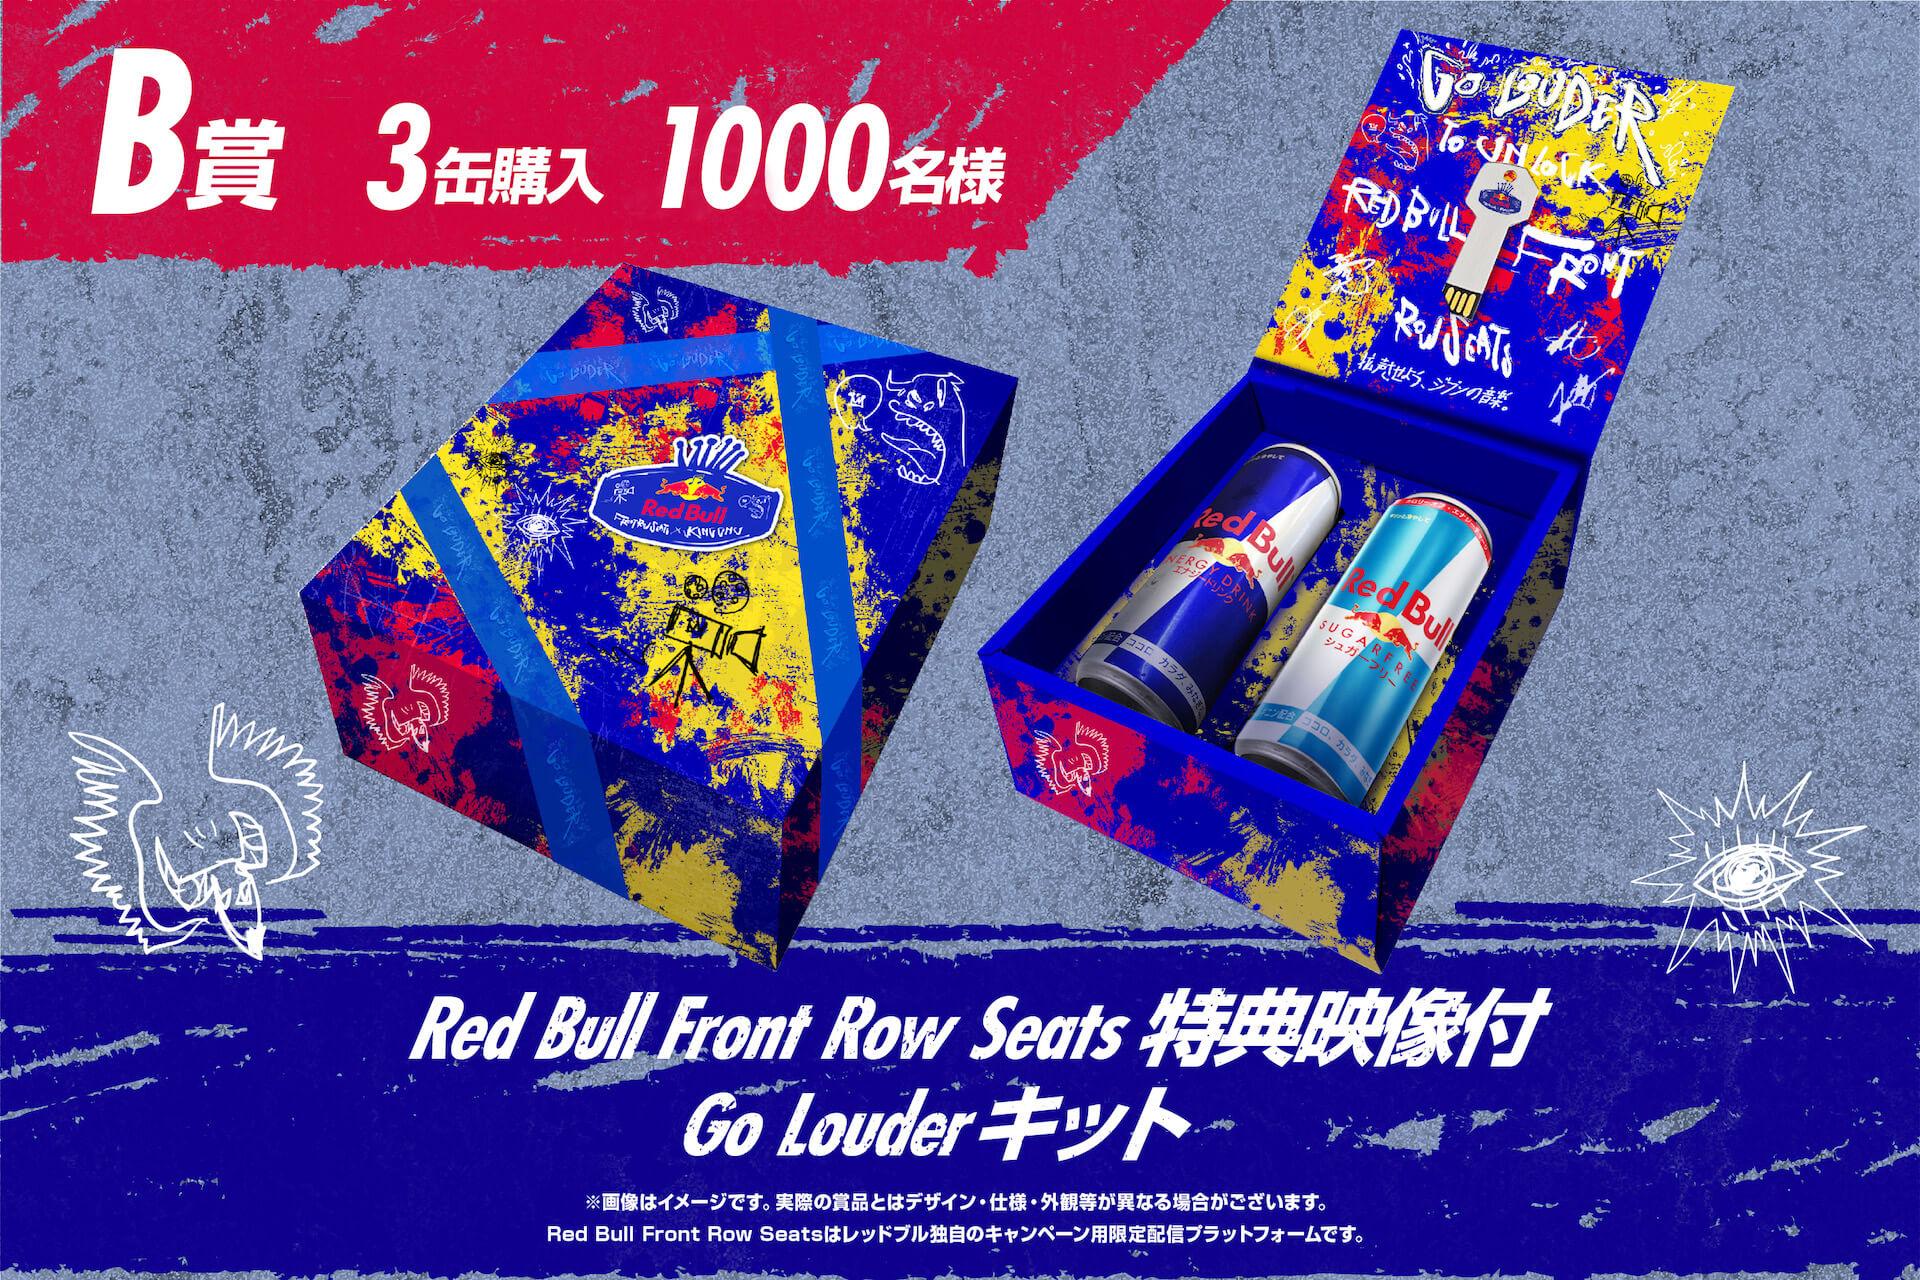 "King Gnuが日本アーティスト史上初めてRed Bullとパートナーシップを締結!""Go Louder""プロジェクトでインタビュー公開&コラボグッズプレゼントも music200908_kinggnu_redbull_4"